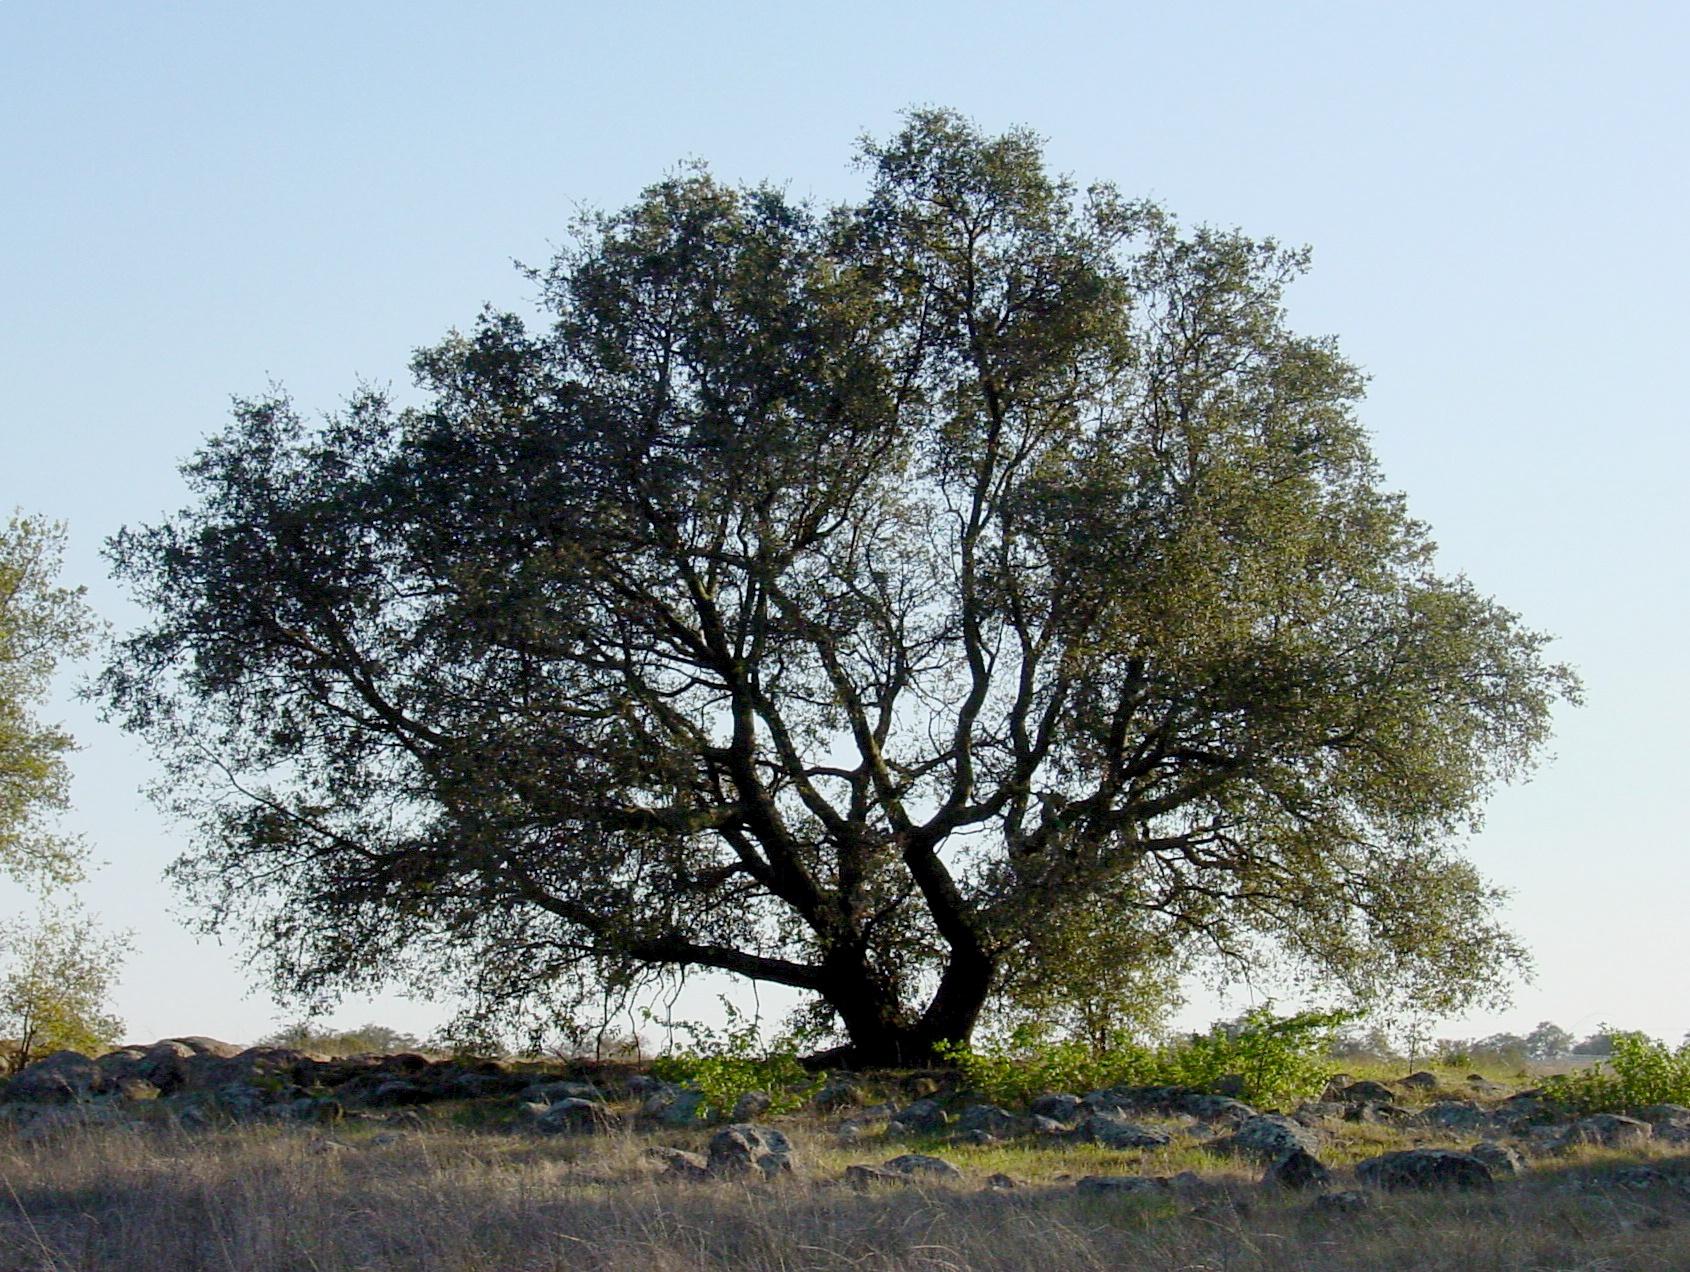 Quercus_englmannii_sillouette.jpg